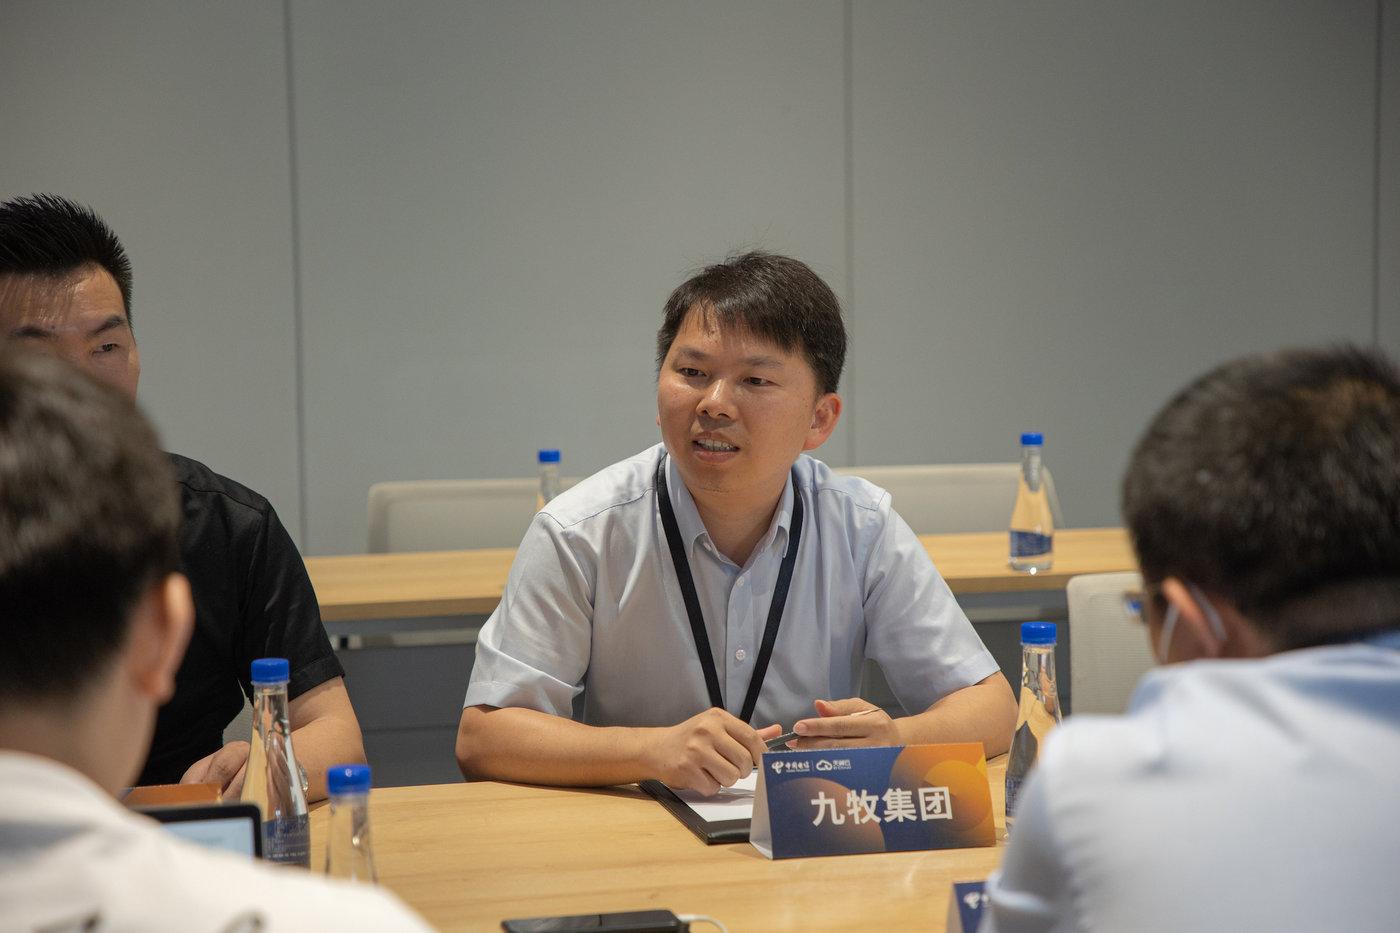 九牧集团CIO叶火龙